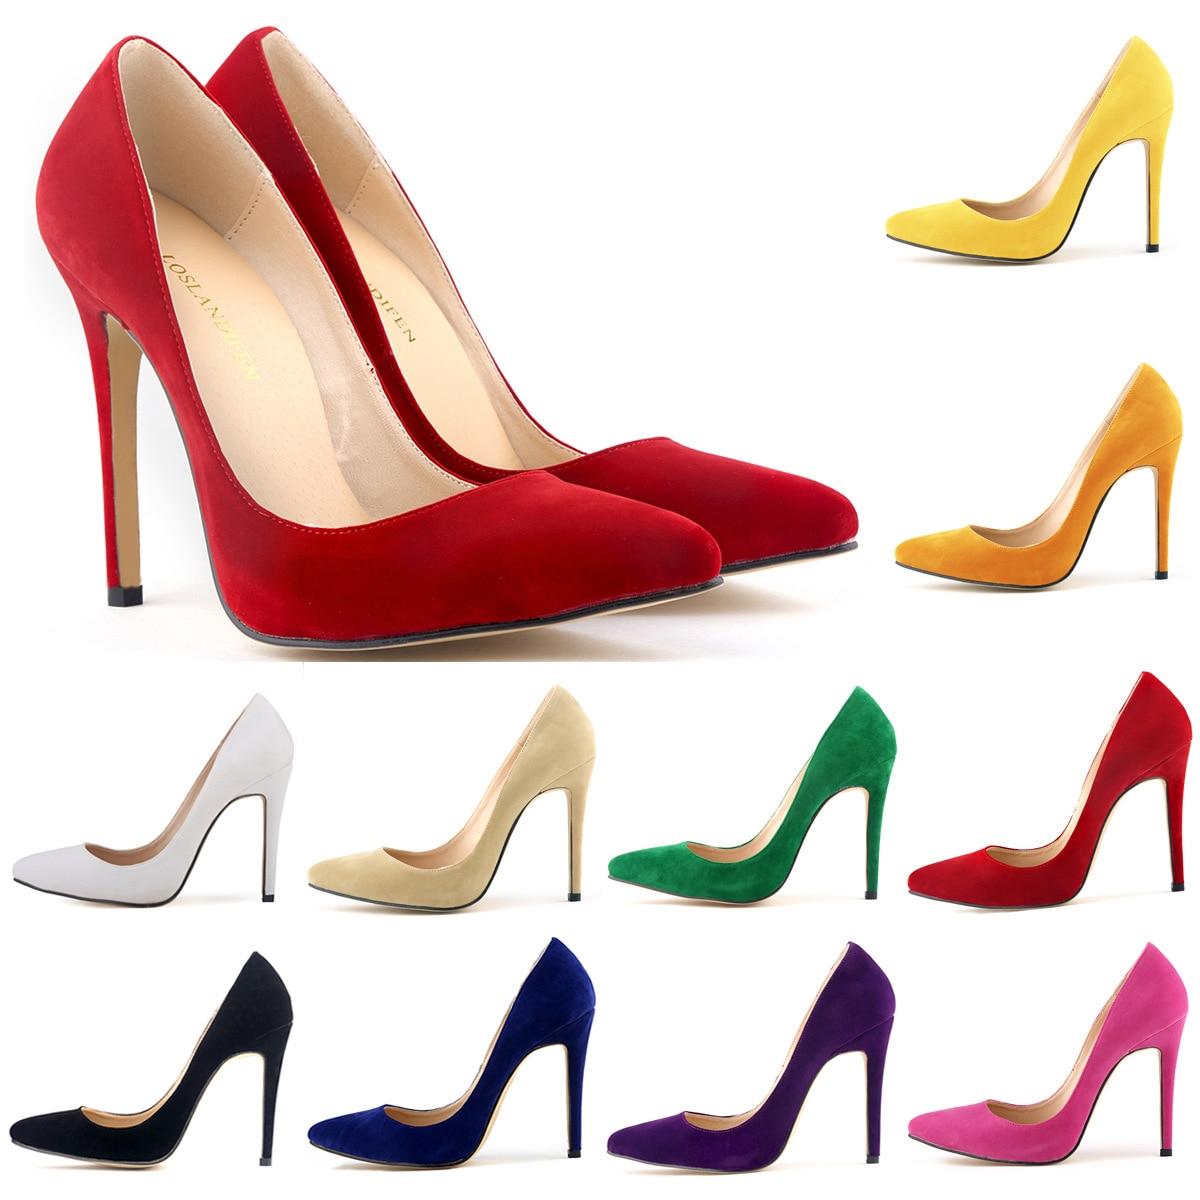 95702fc5ae3 CooLcept FREE SHIPPING high heel shoes quality dress ladies fashion ...